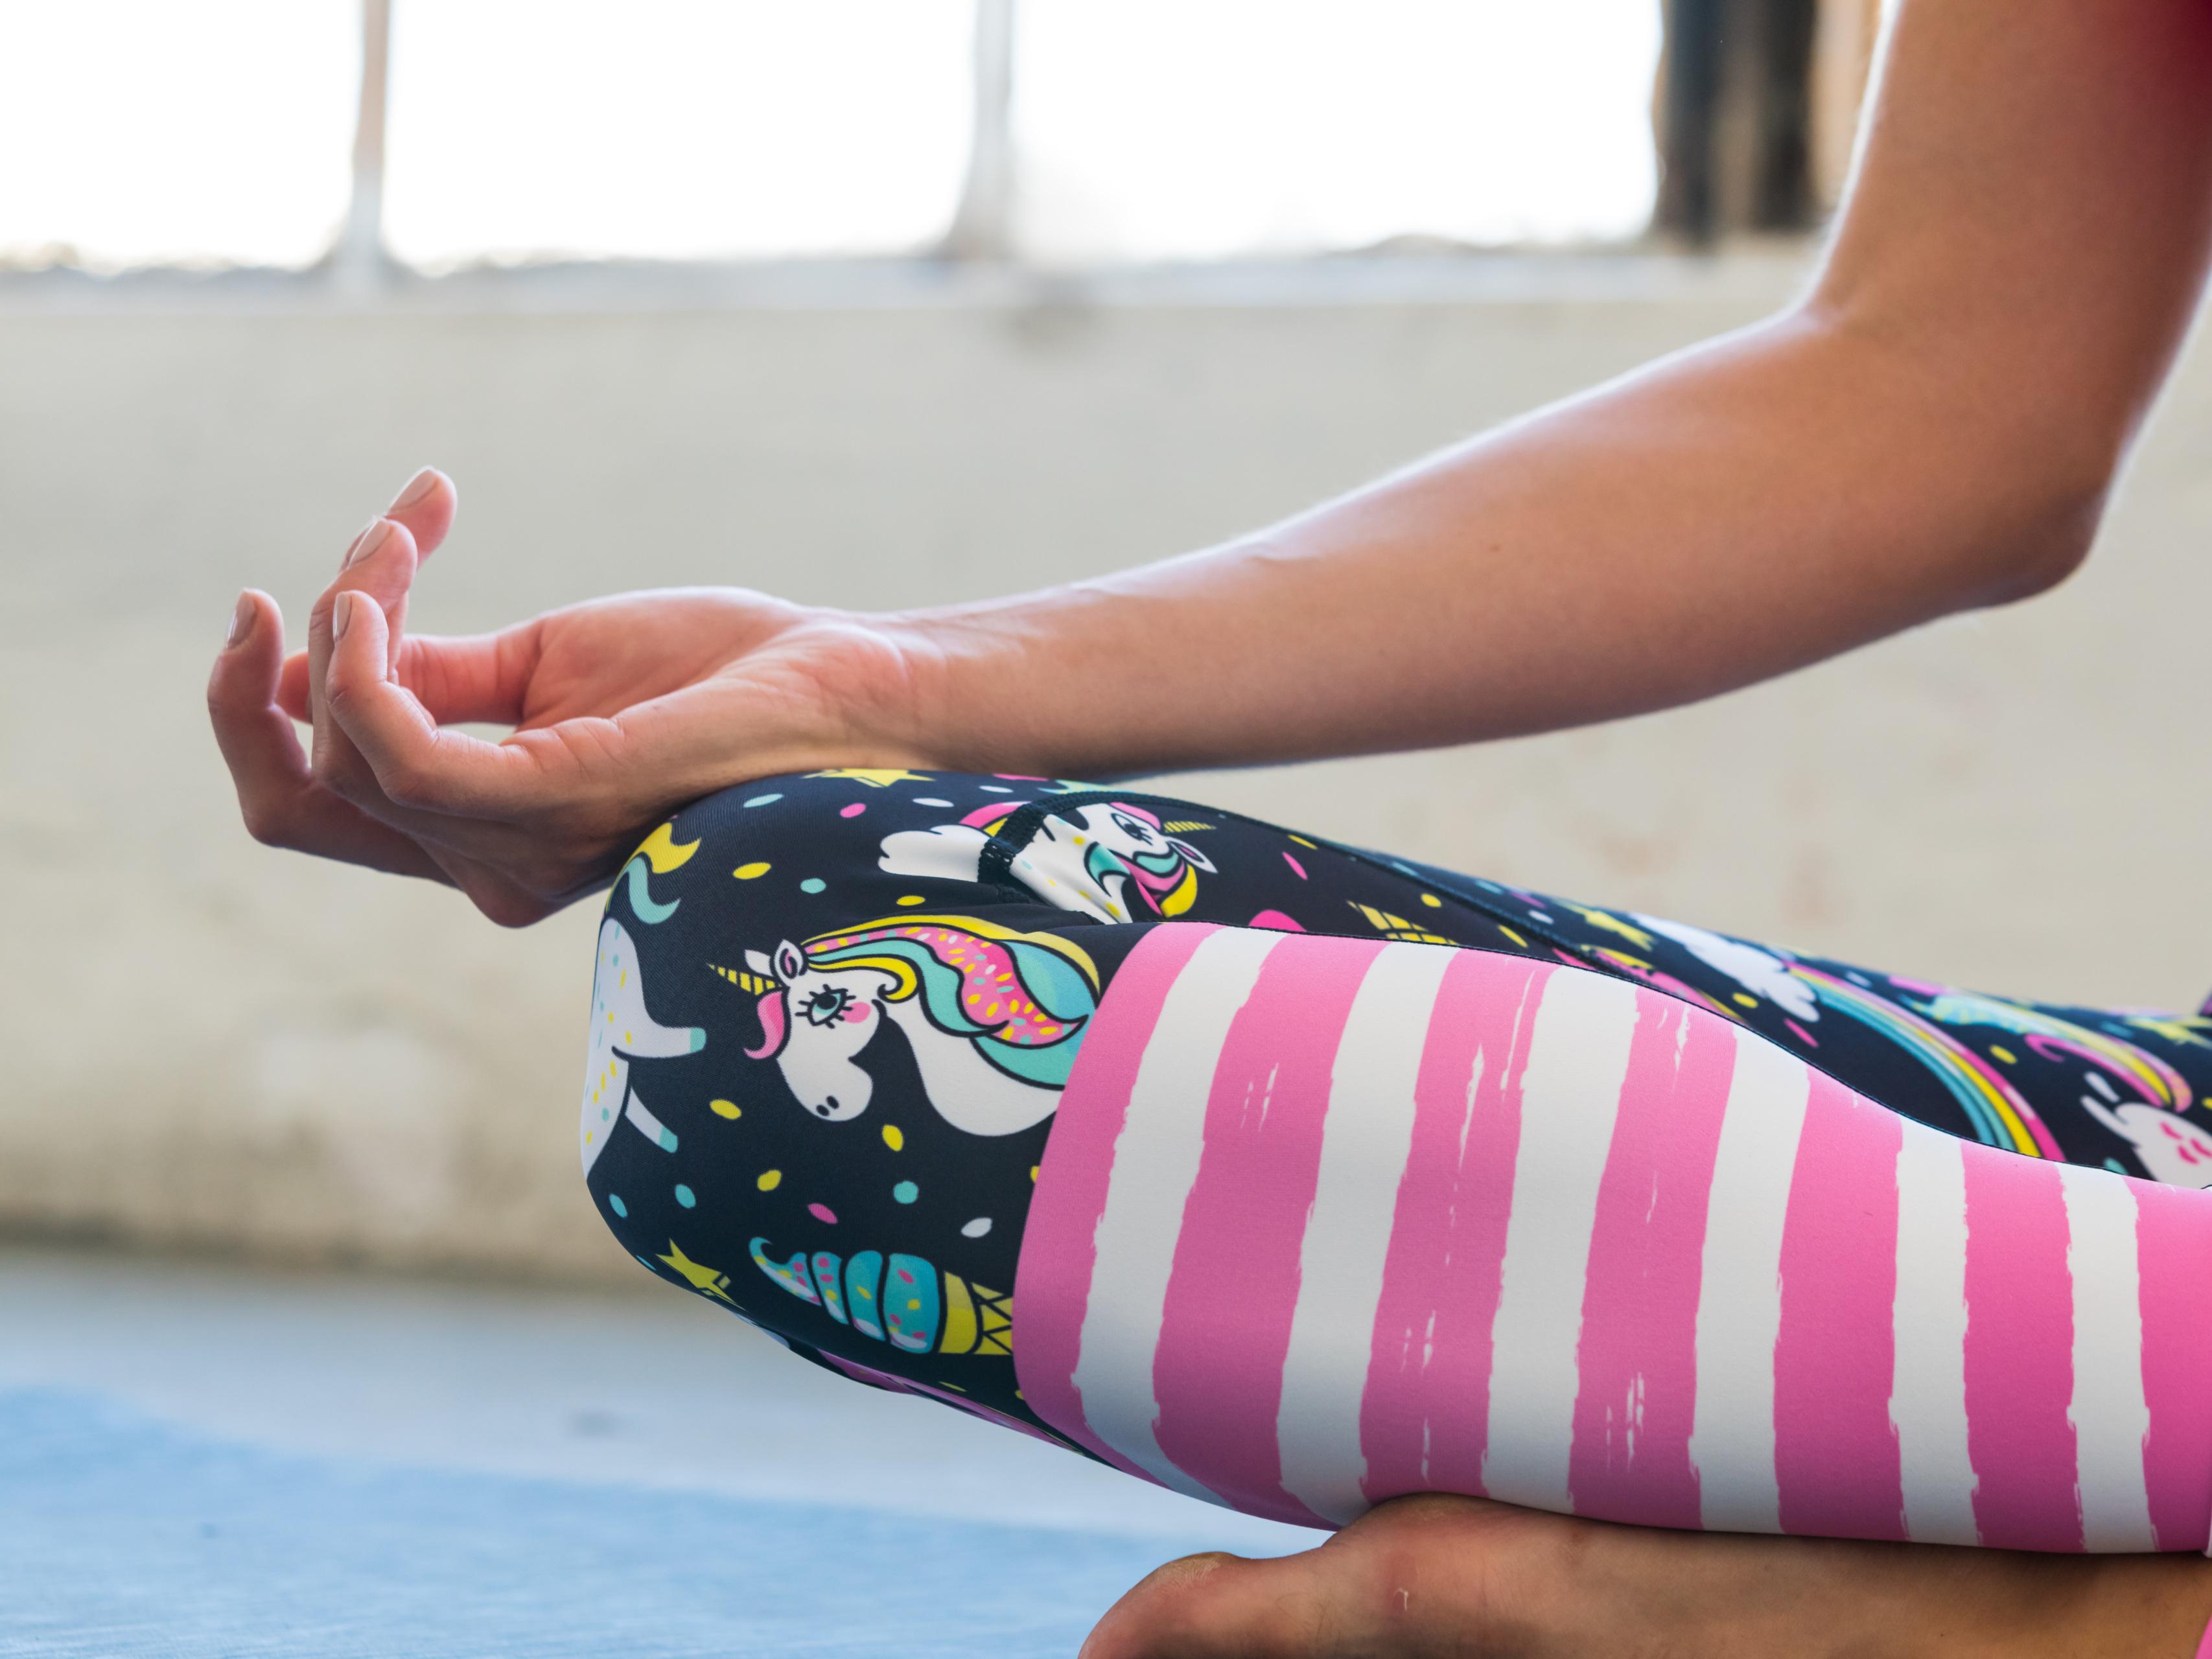 f797c35cbf725 Flexi Lexi Fitness Womens Rainbow and Unicorn Yoga Pants Sports Leggings